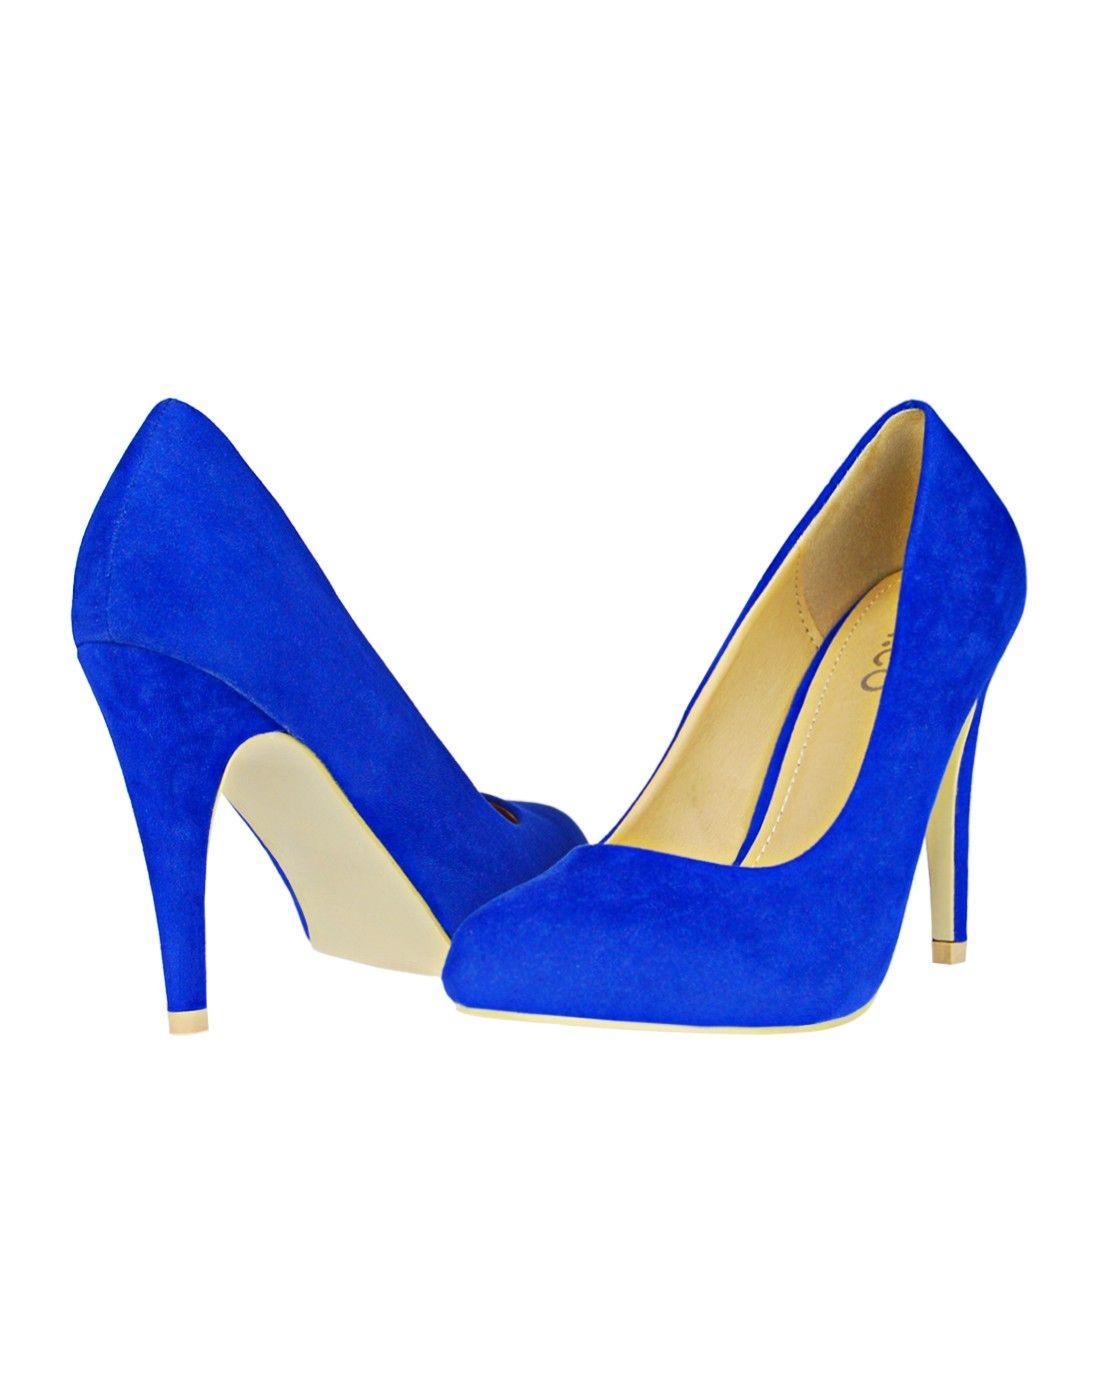 Royal blue heels, Blue heels, Blue pumps